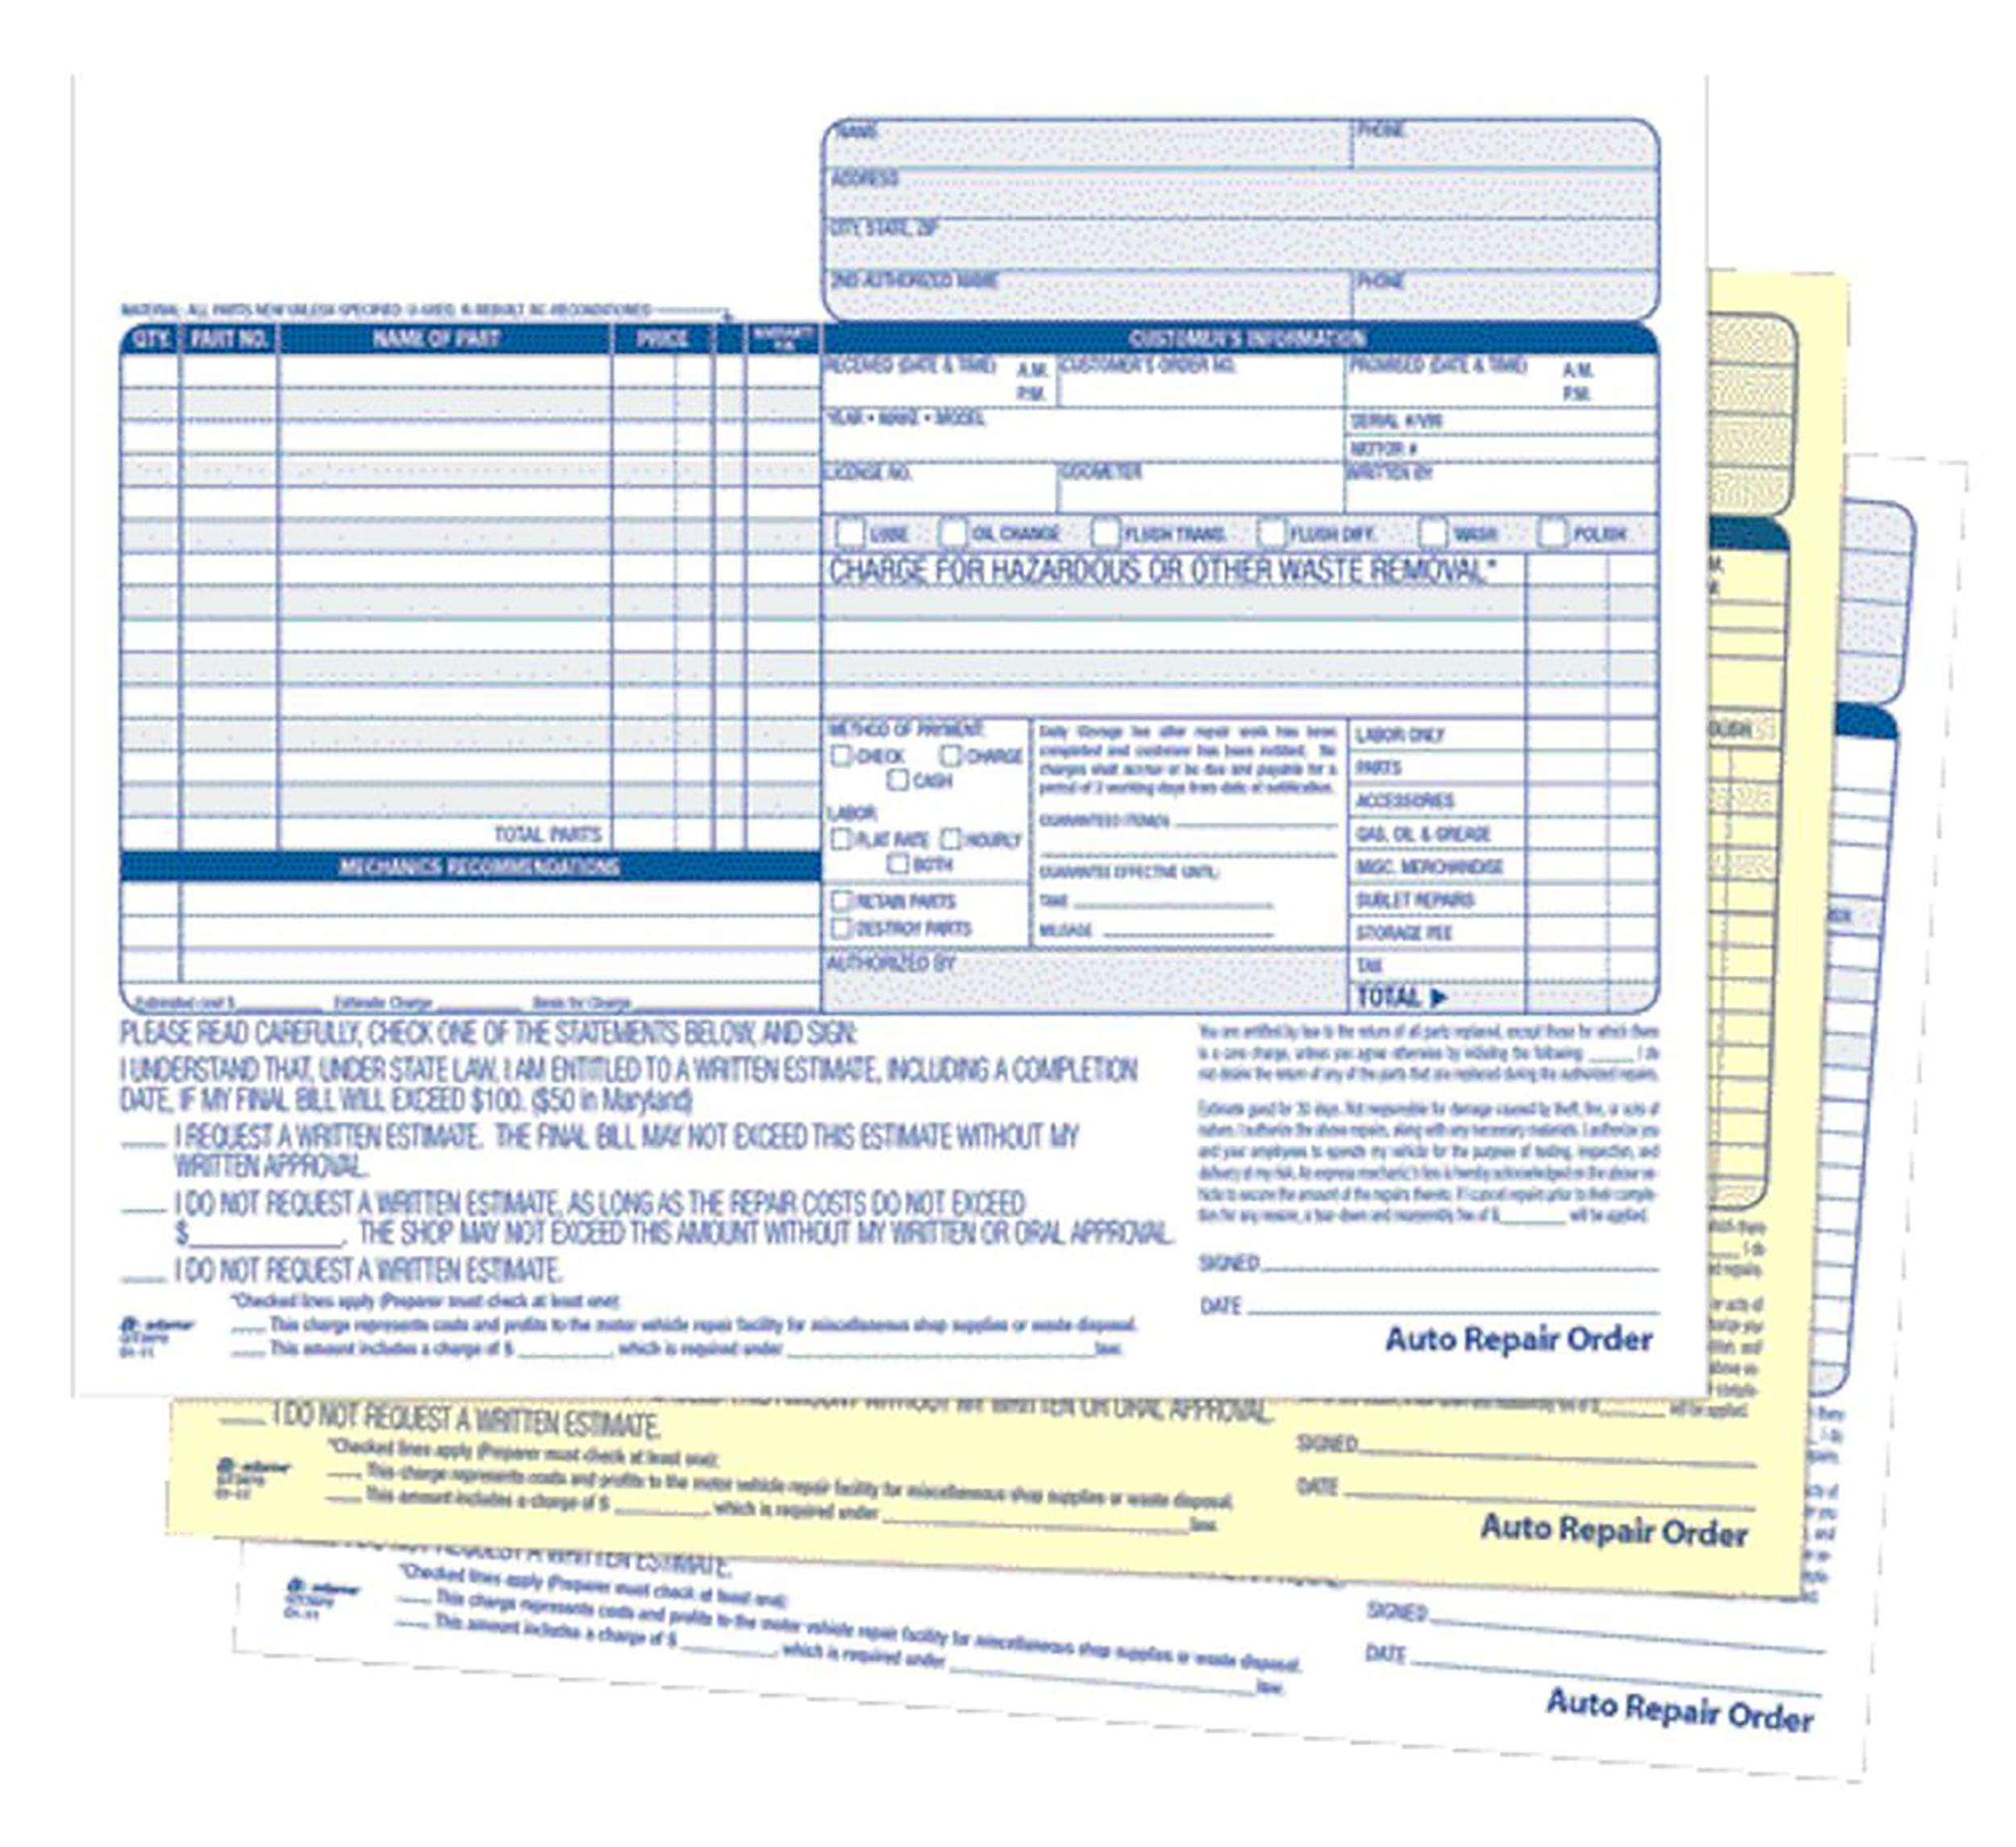 adams 3 part carbonless garage auto order sets 50 unit sets free auto repair forms for transmissions shops